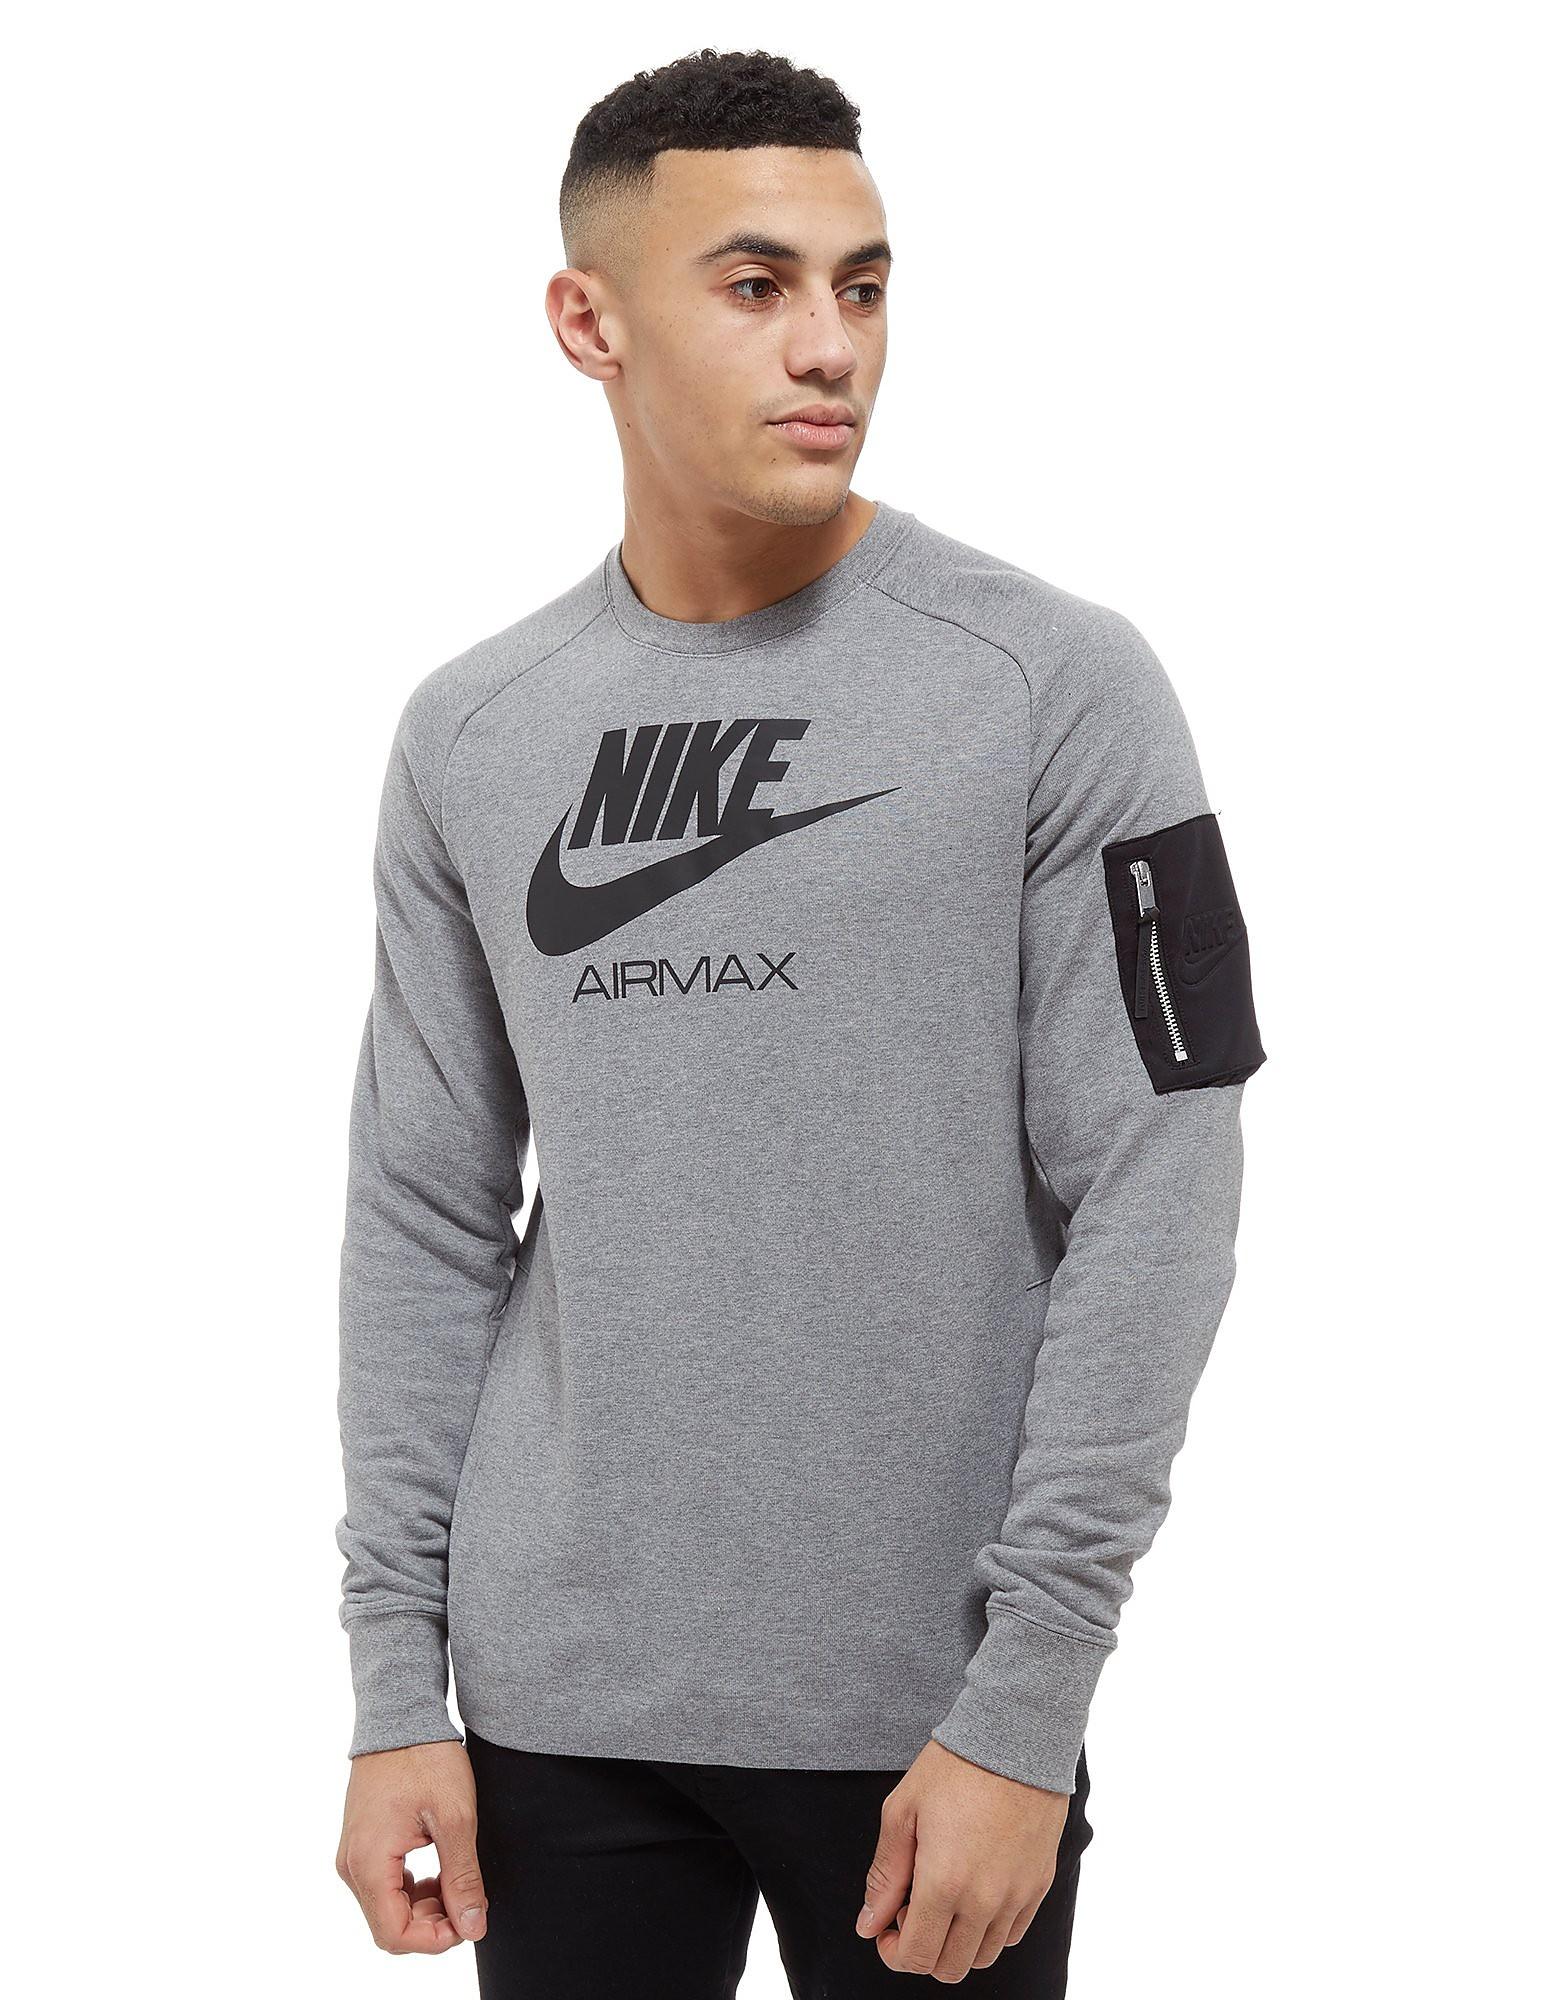 Nike Air Max FT Crew Sweatshirt